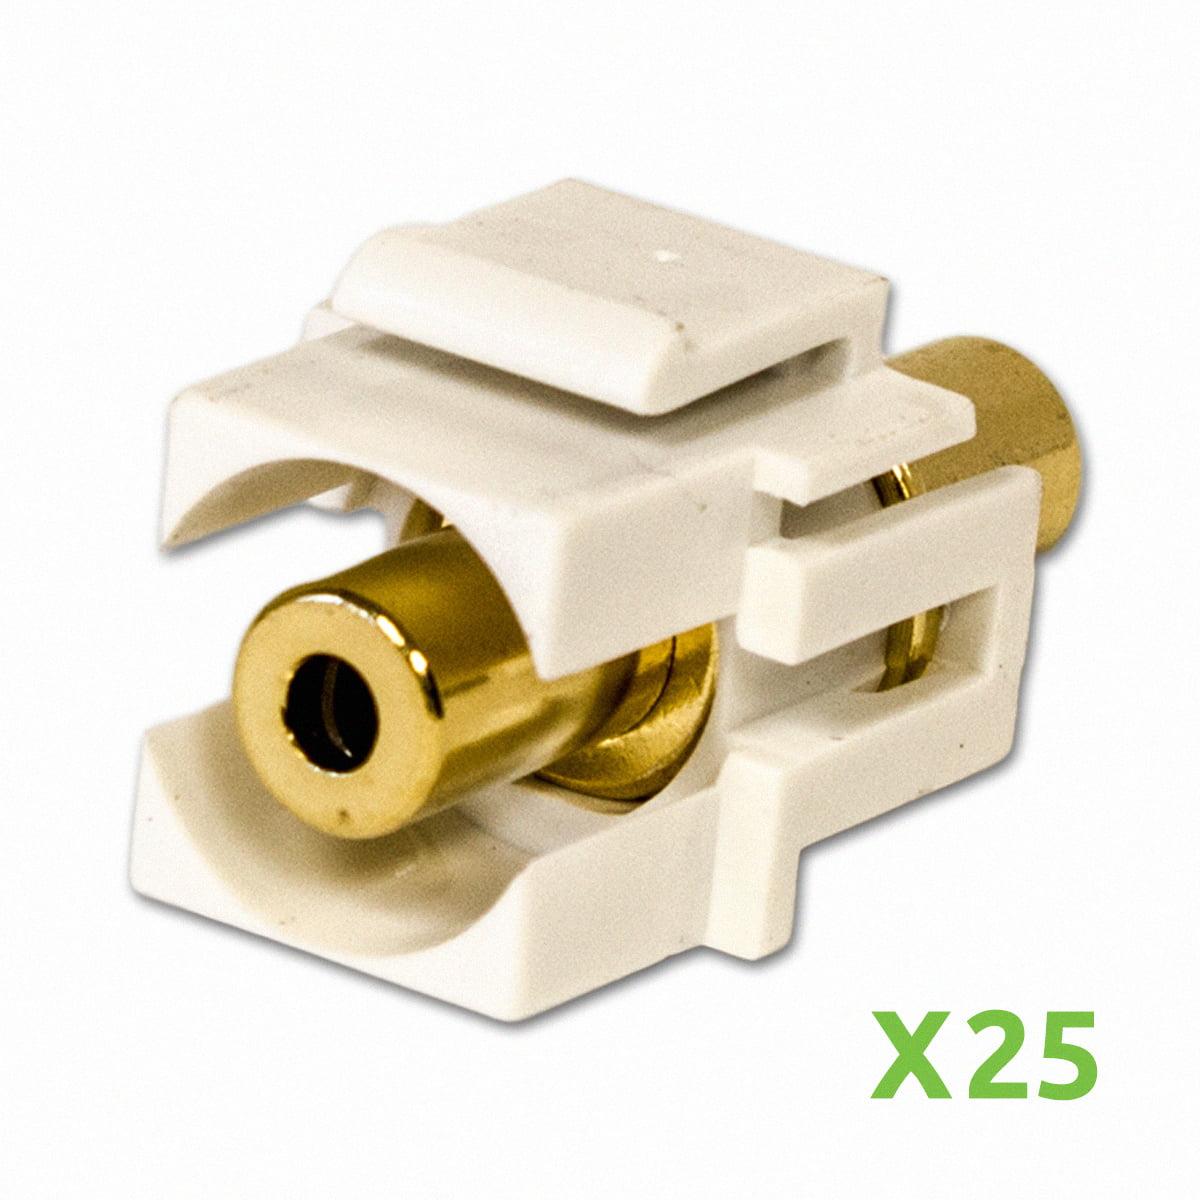 NavePoint 3.5mm Female to Female Keystone Adapter White 25-pack